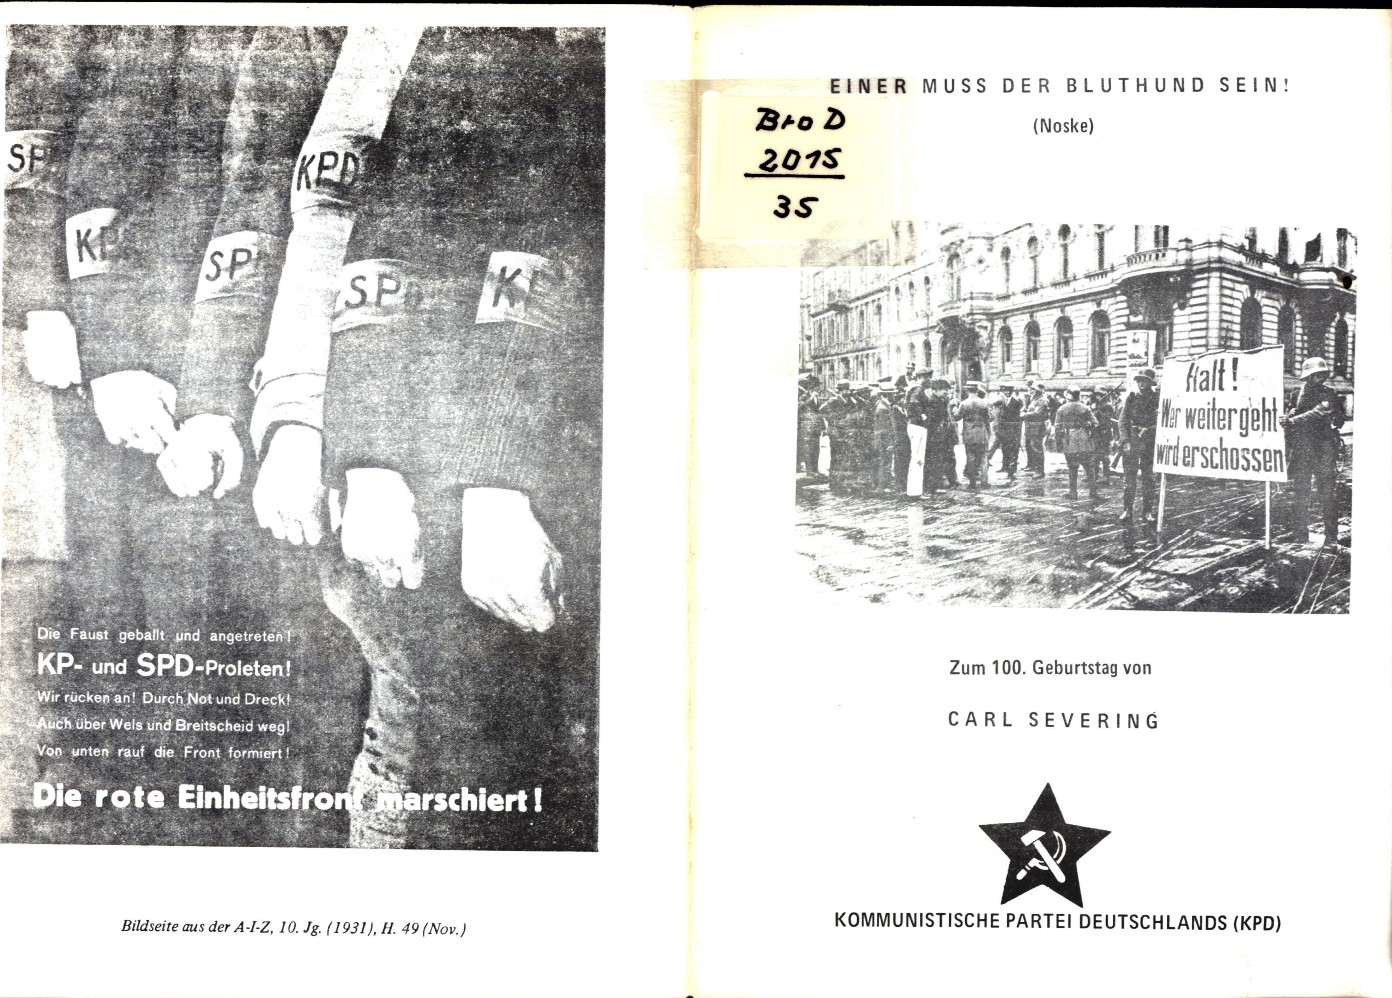 Bielefeld_KPD_1975_Carl_Severing_01